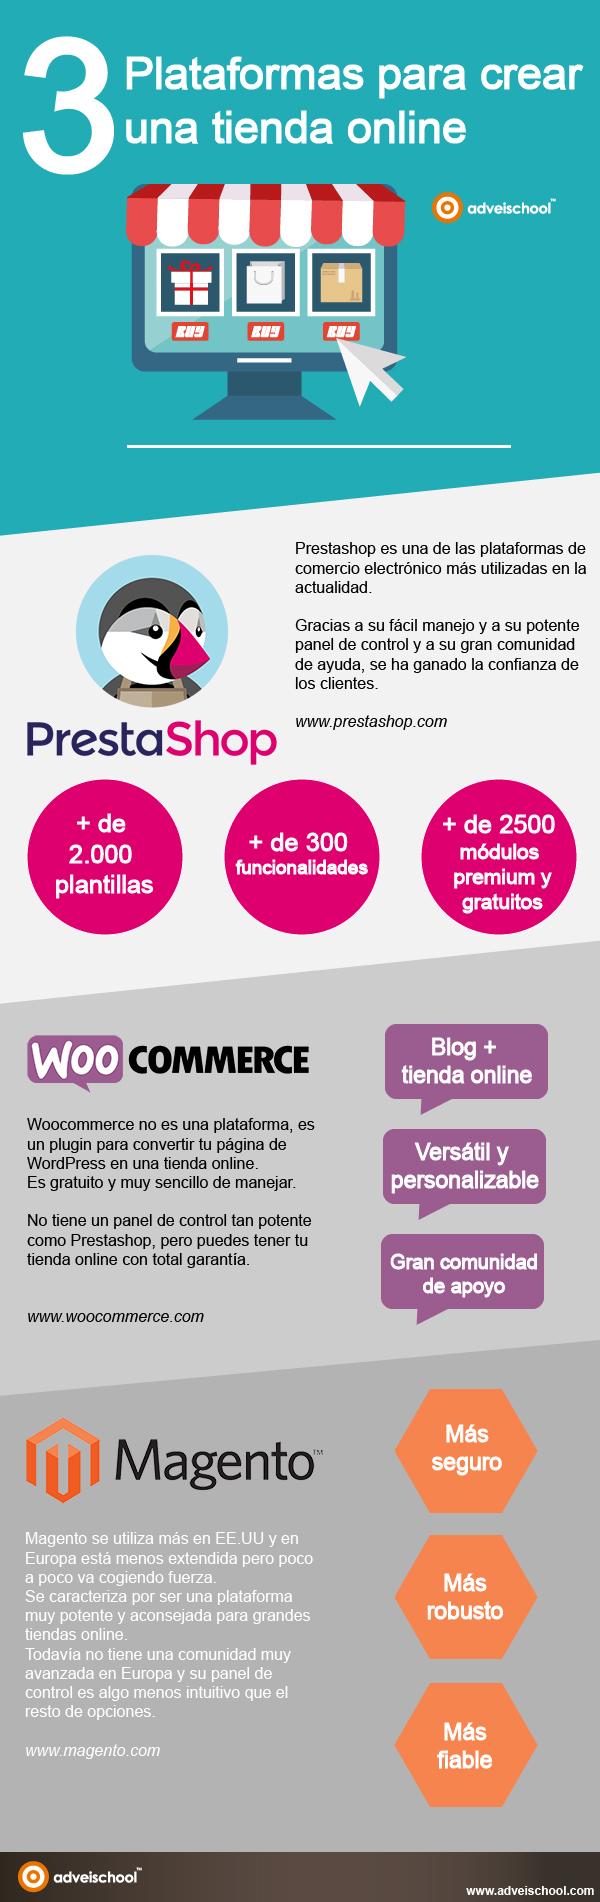 3 plataformas para crear una Tienda Online #infografia #infographic #ecommerce